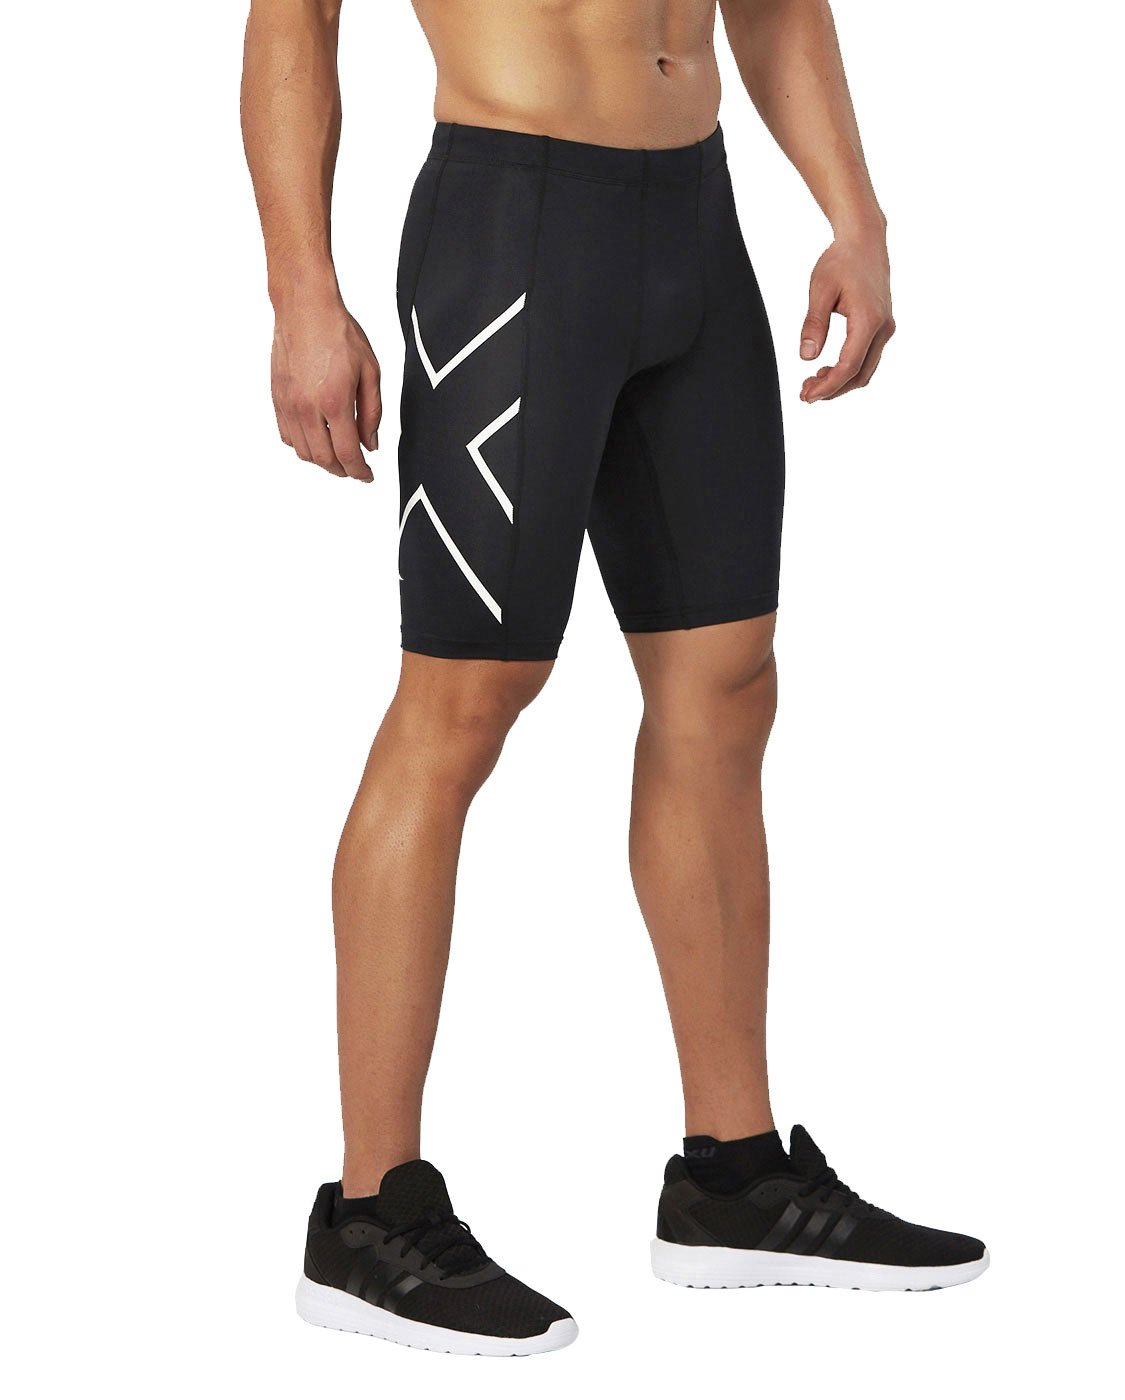 2XU Men's TR 2 Compression Shorts, Black/White, X-Large